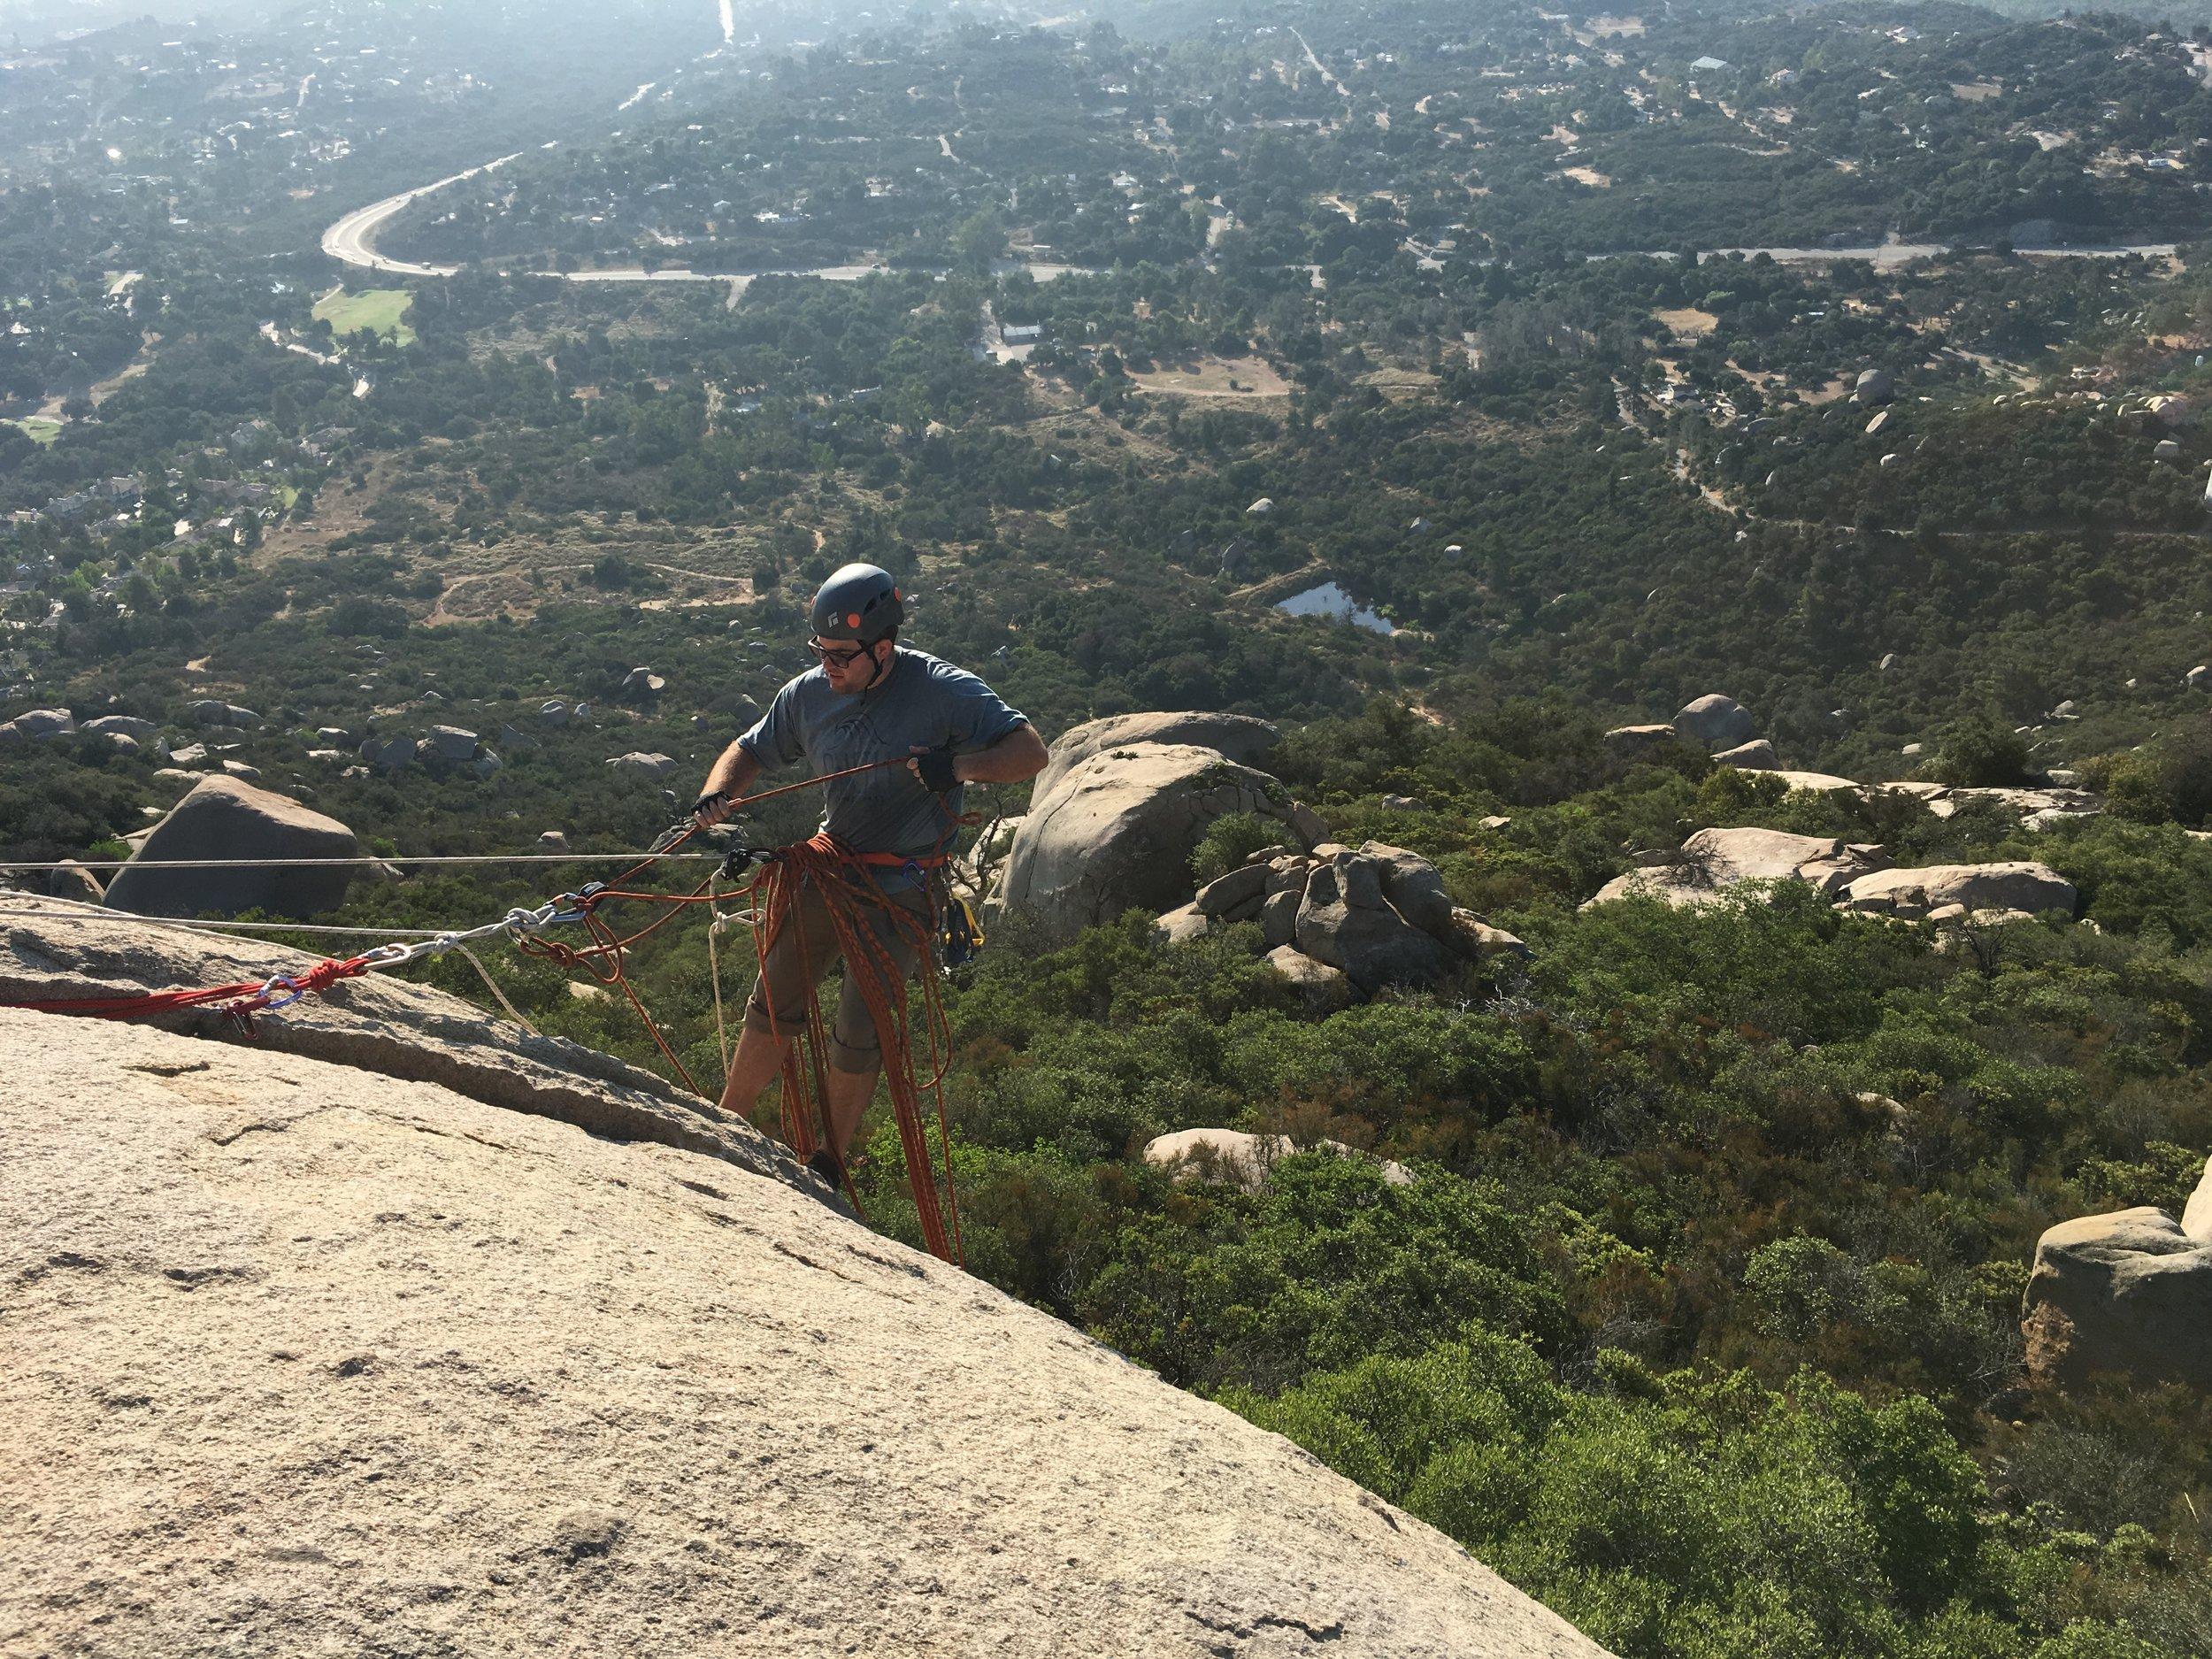 Mt. Woodson Sunrise, Elsa's Crack, Southern California Rock Climbing San Diego